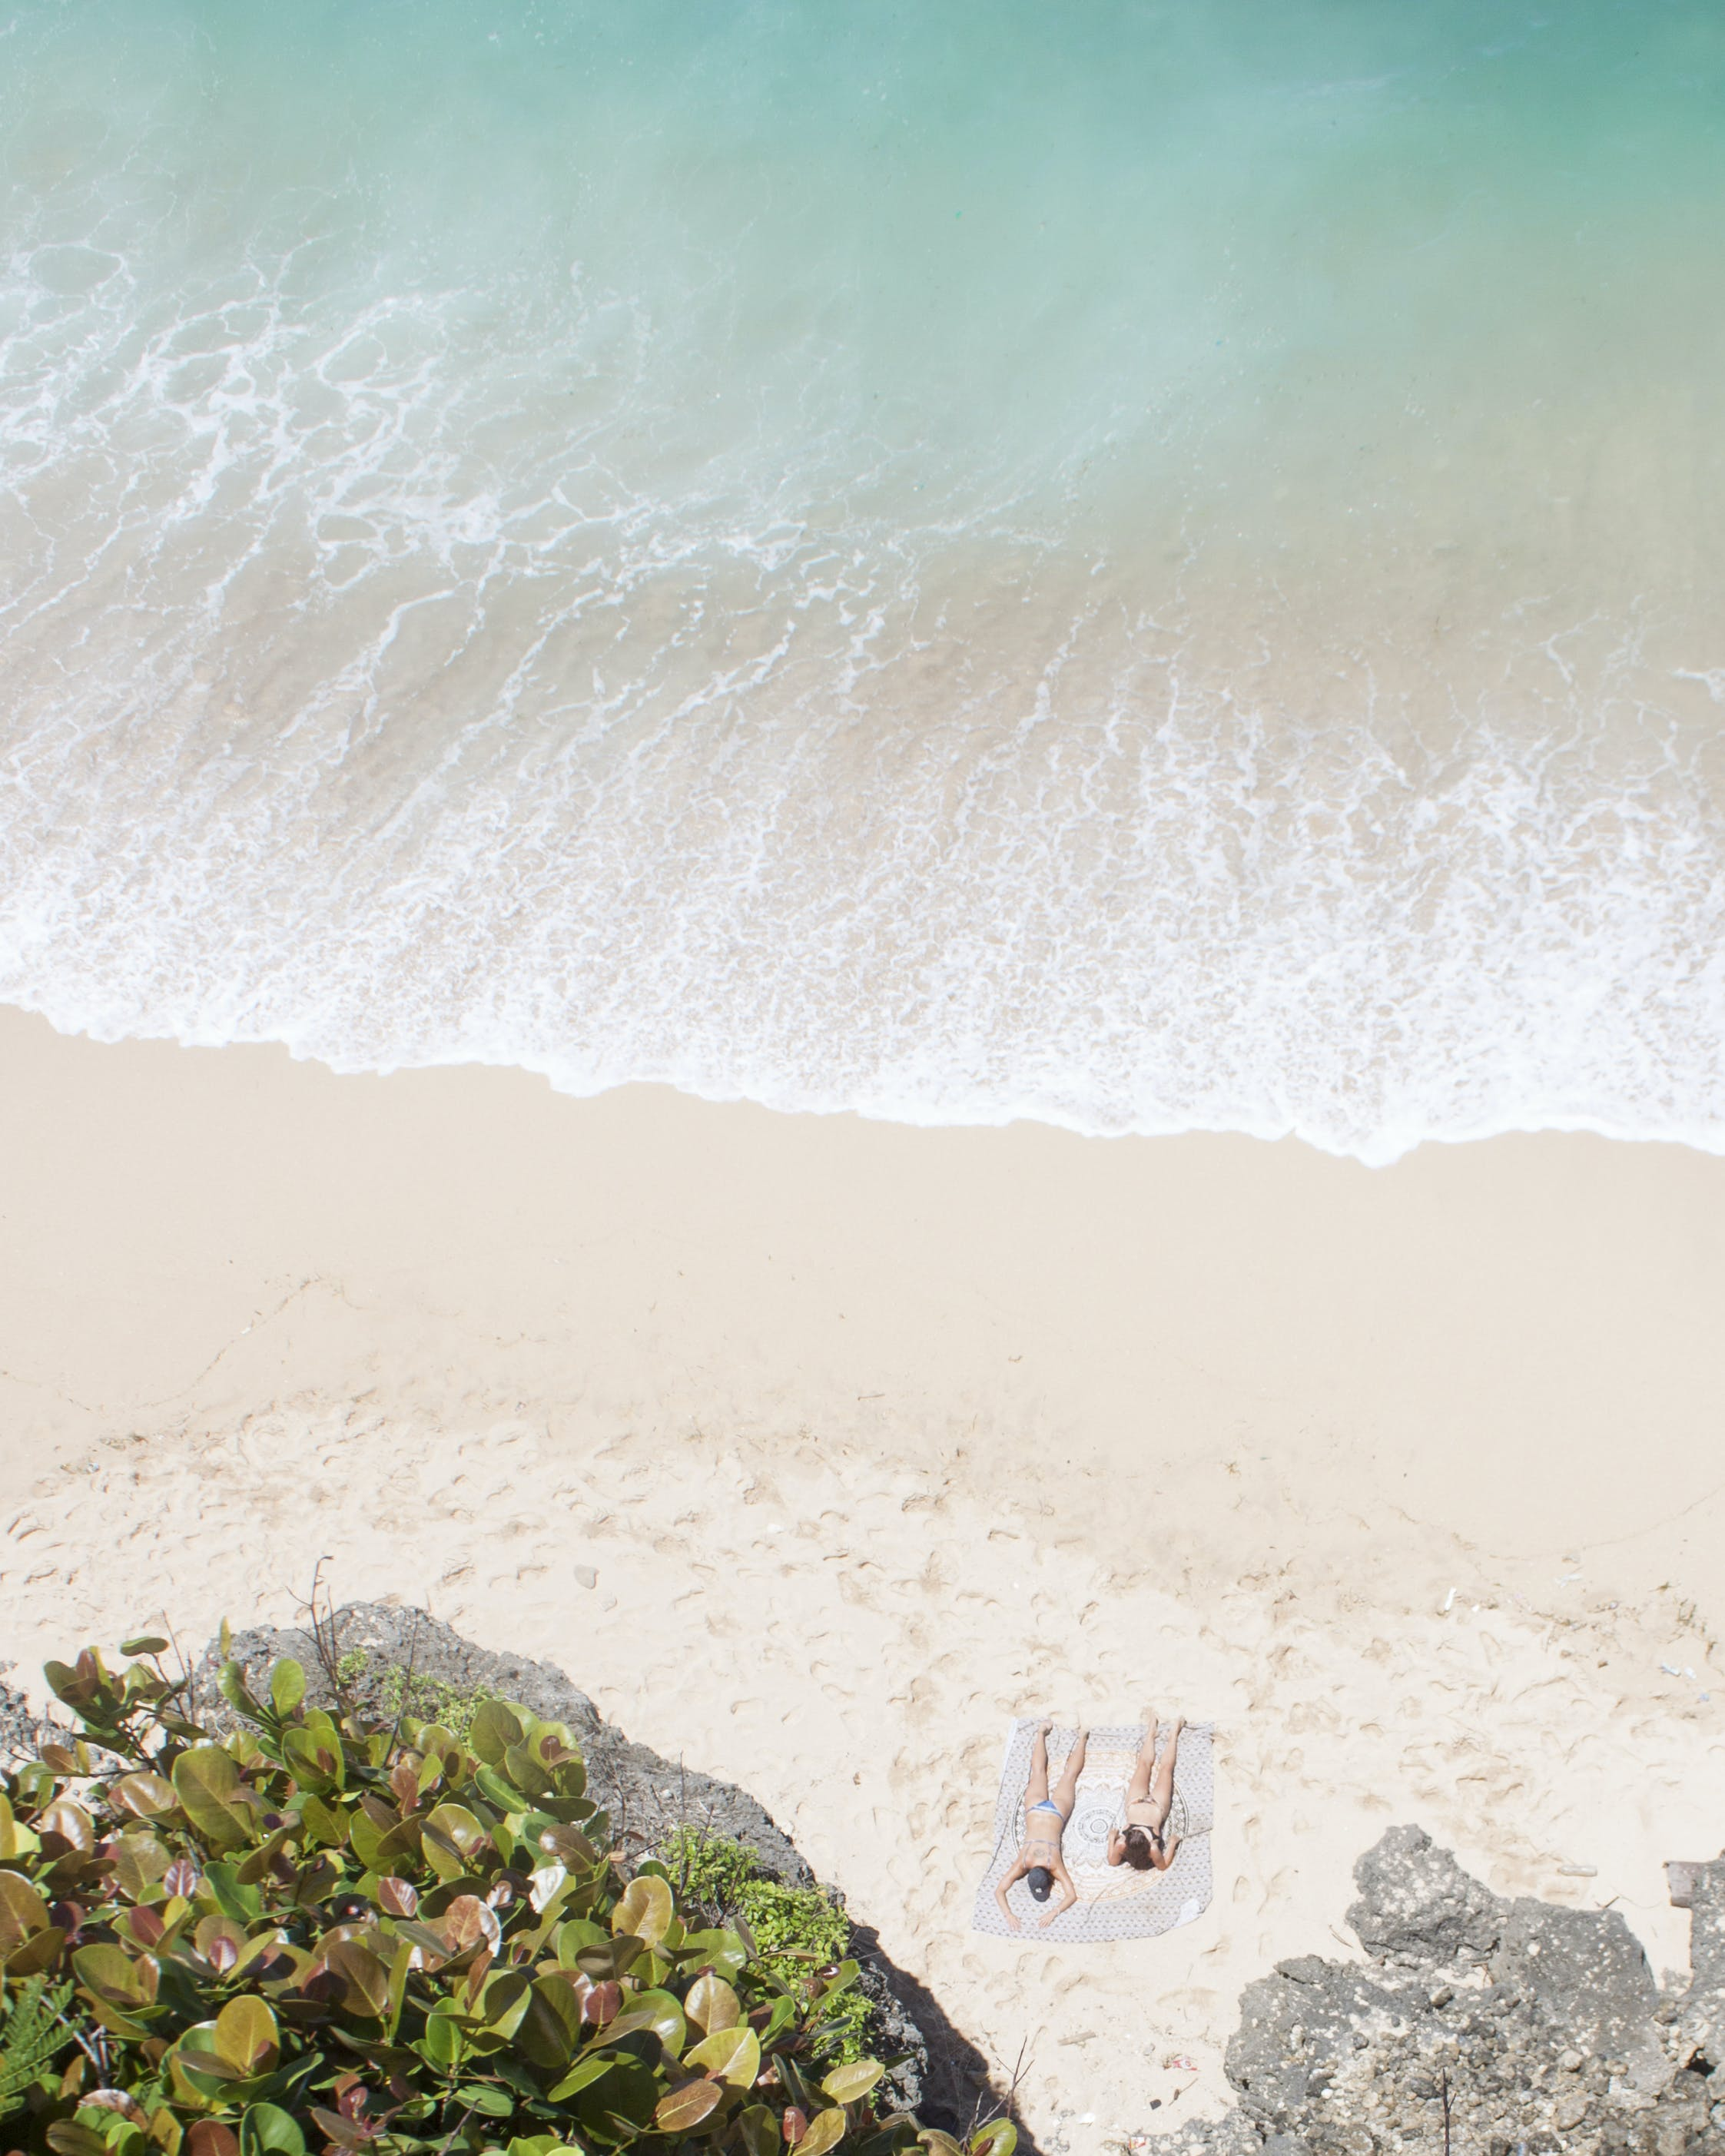 Photo of People Sunbathing on Beach